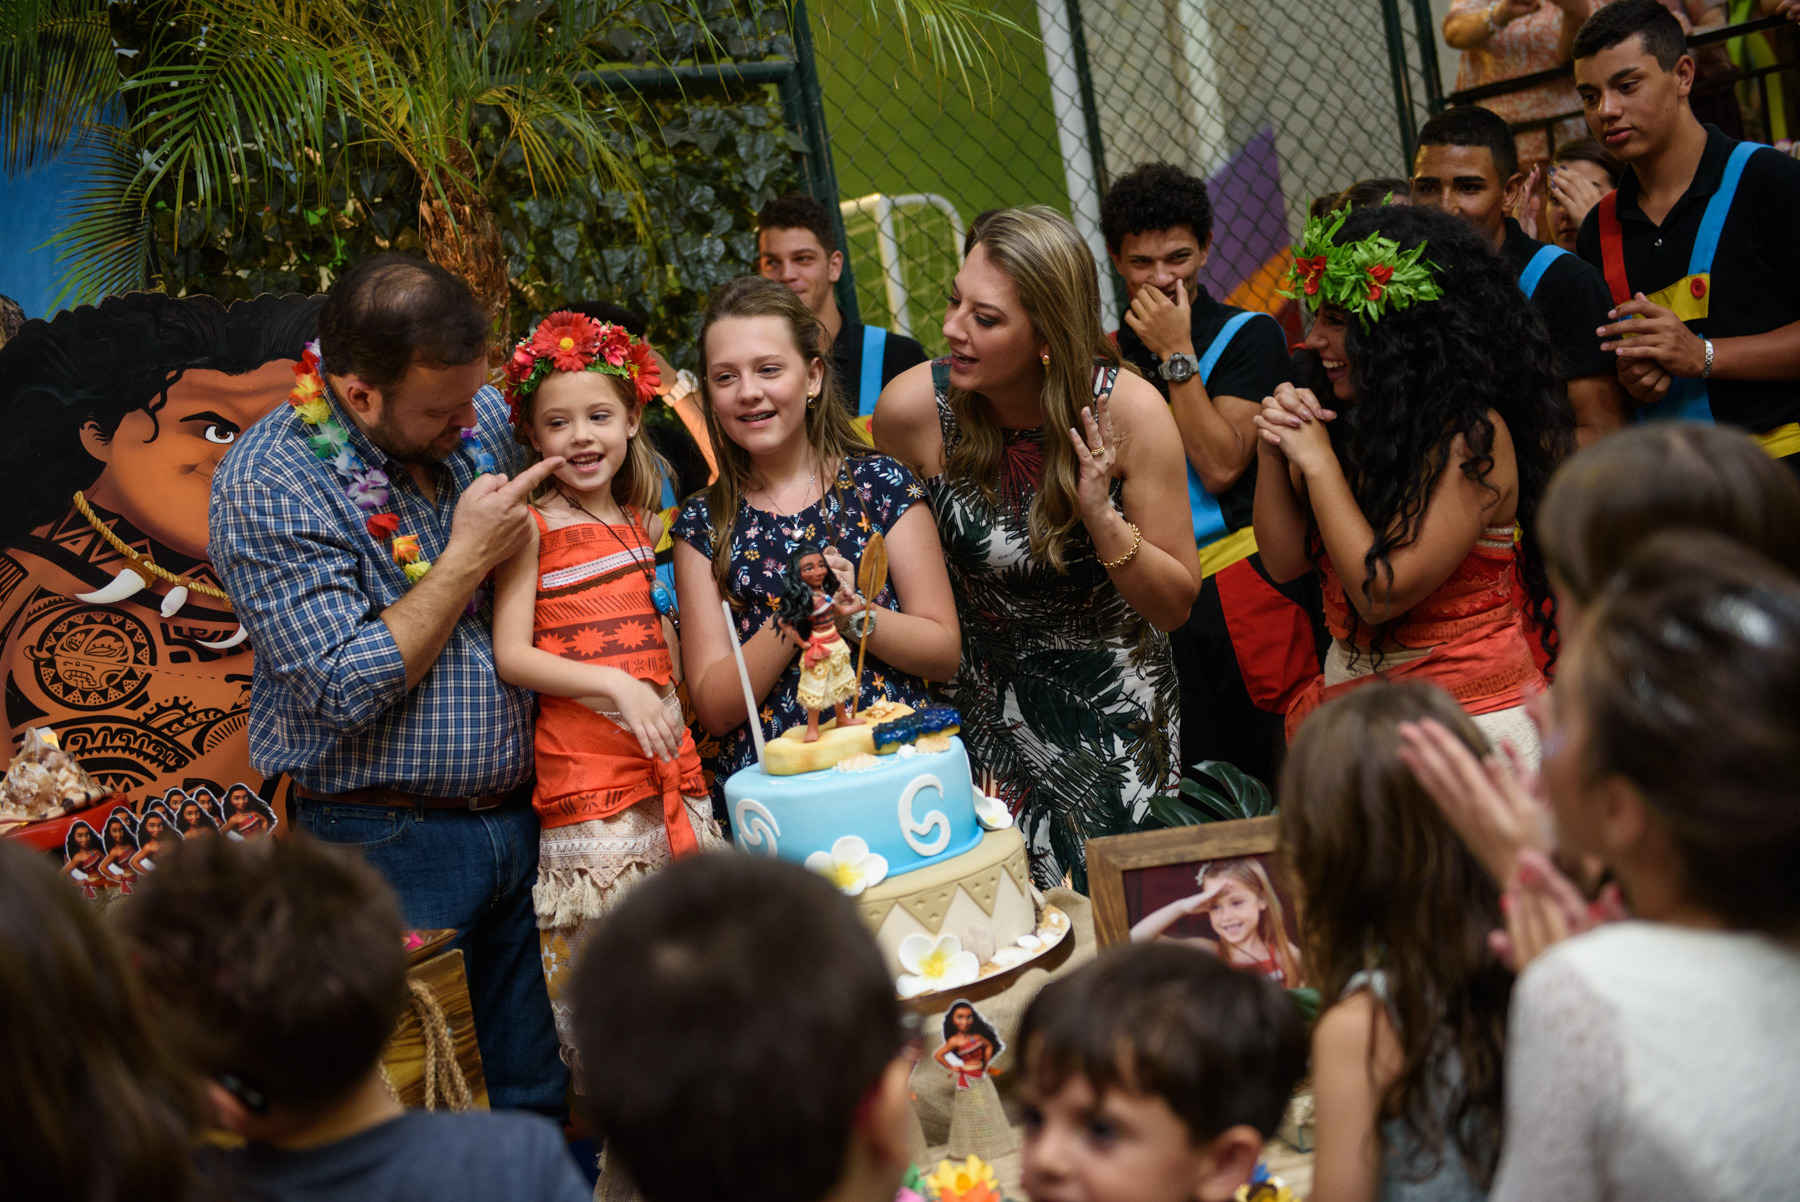 016_fotografia-aniversario-infantil-moana-curitiba-buffet-brigadeiro-guswanderley.jpg